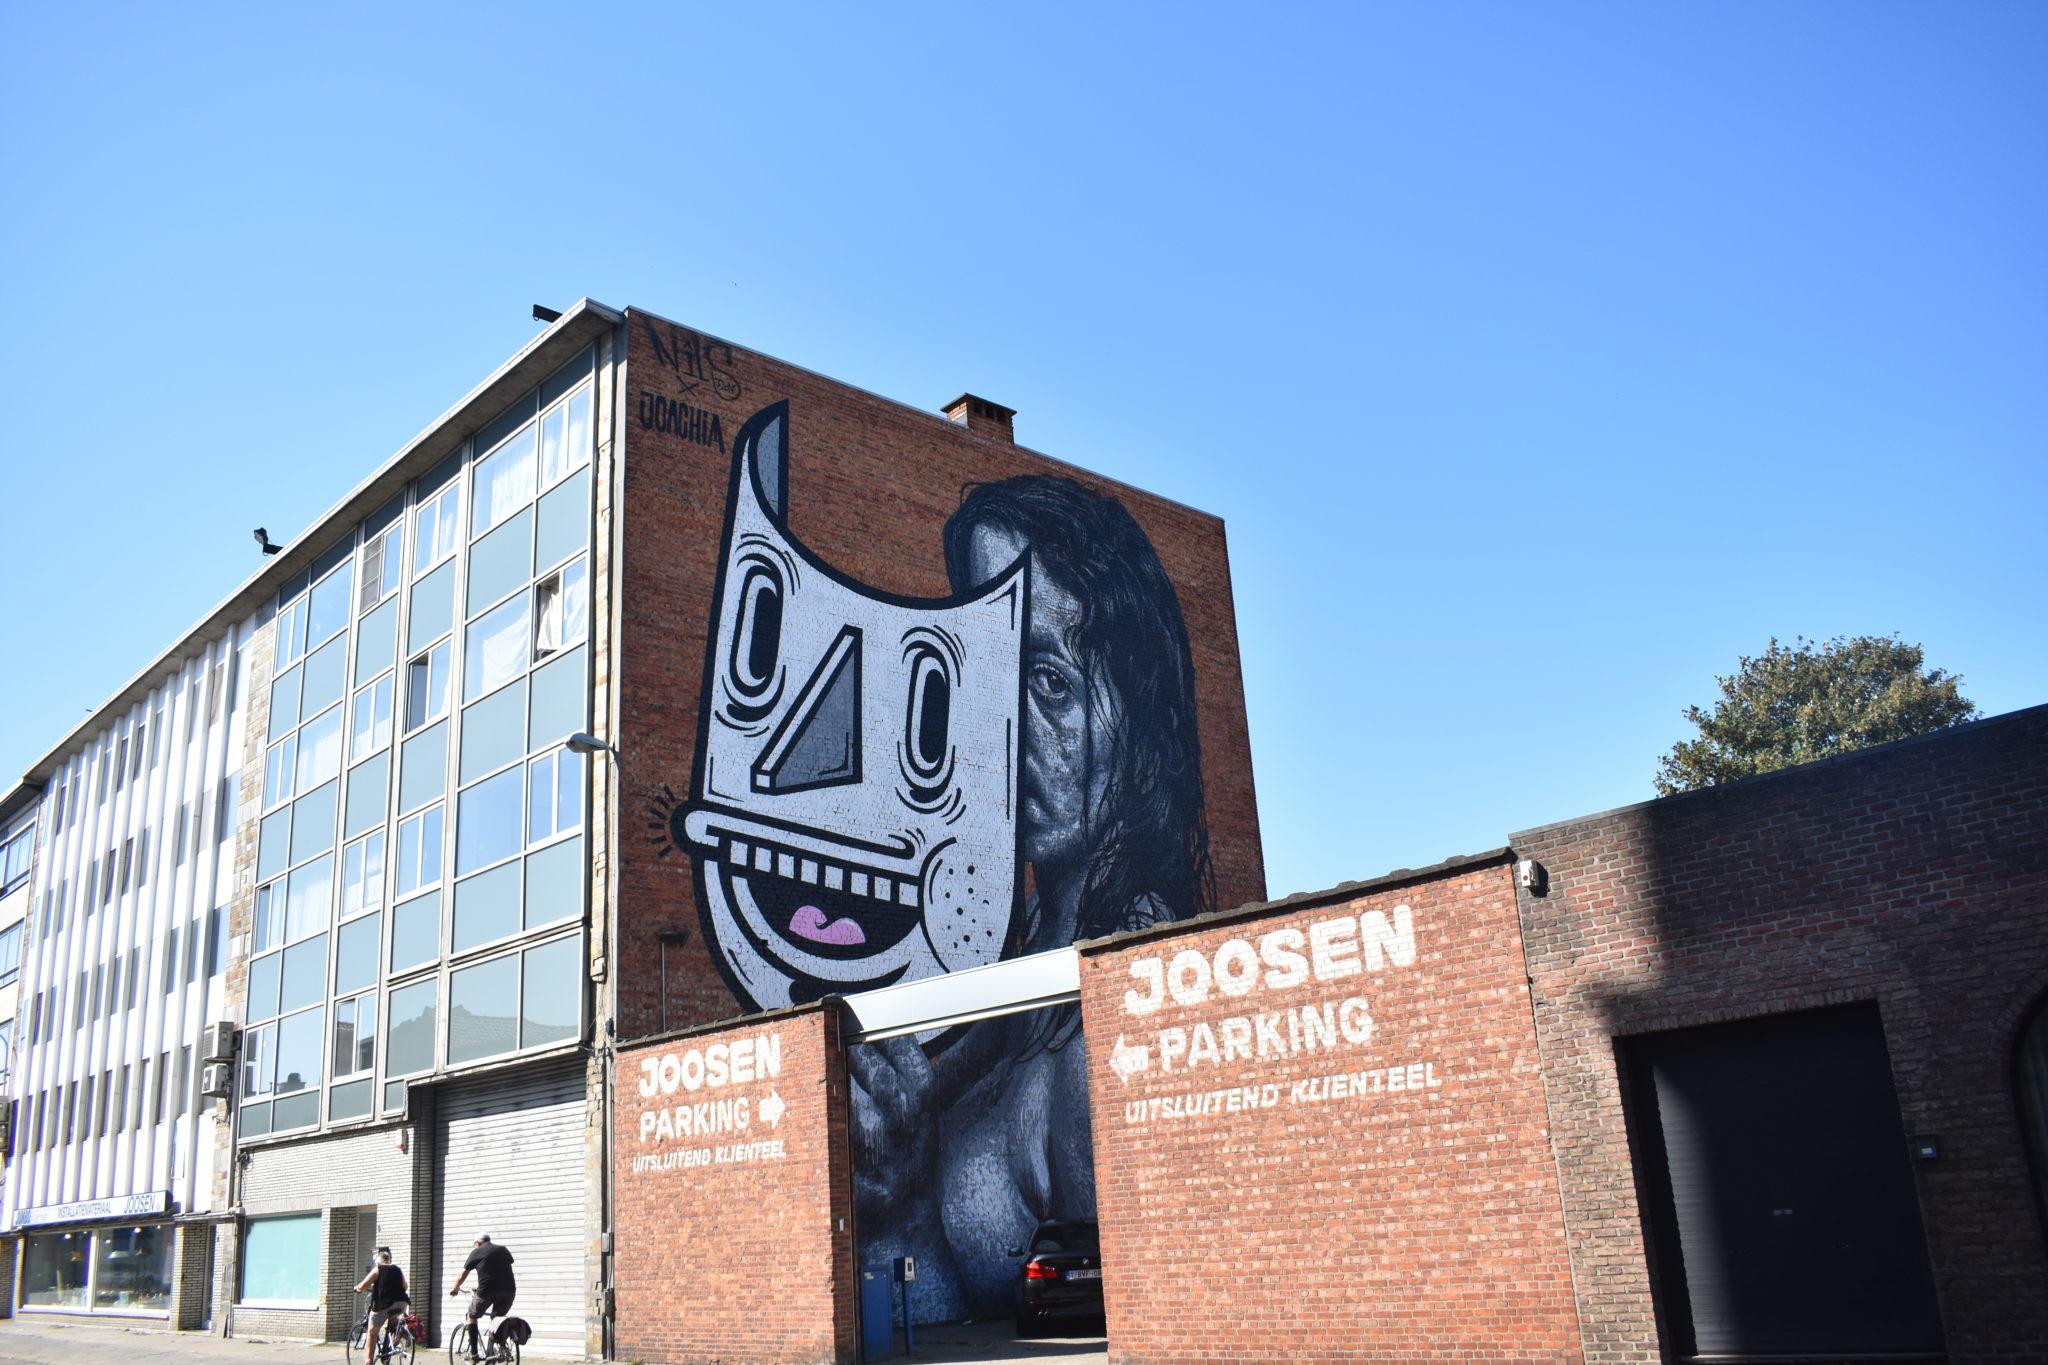 Nils & Joachim street art antwerp